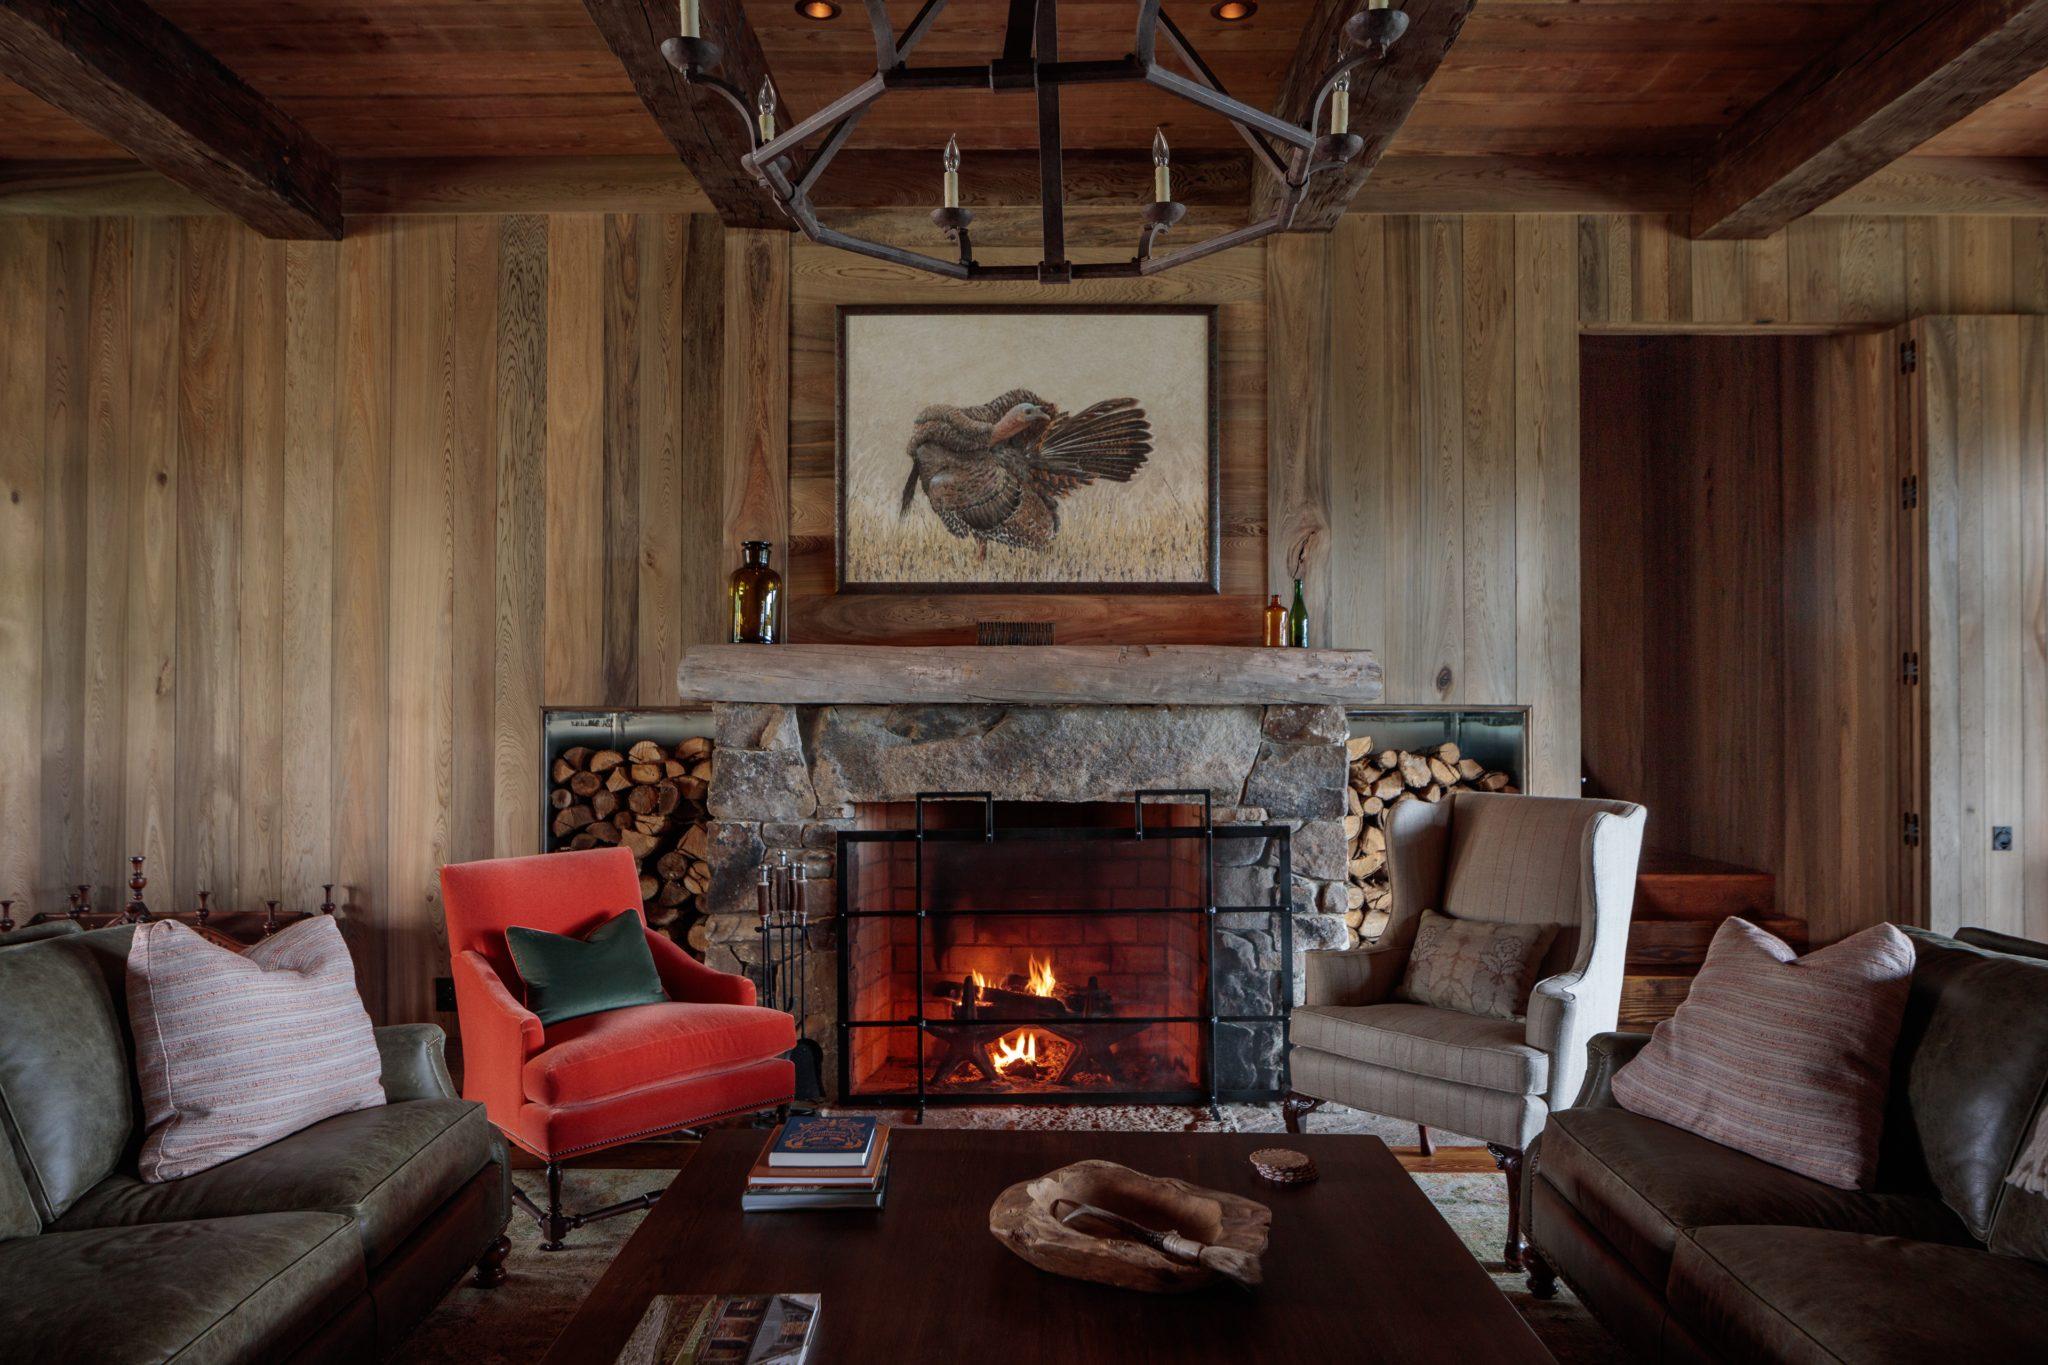 Mountain Lodges Cabin Inspired Interiors Chairish Blog